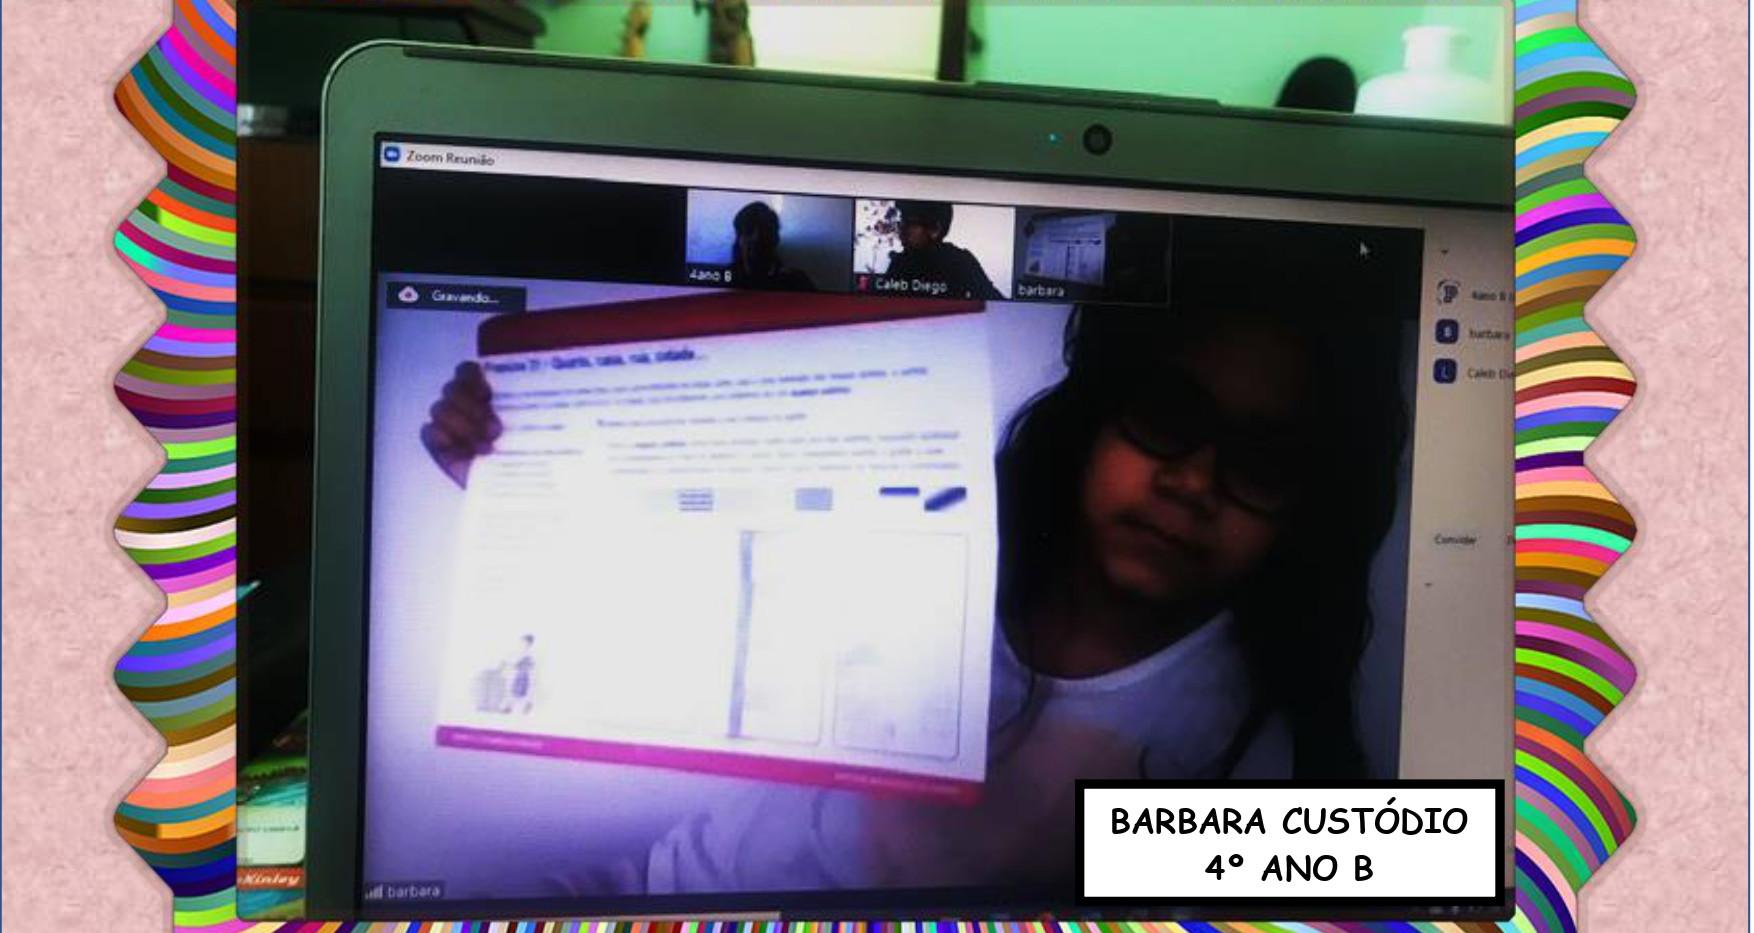 Barbara_page-0001.jpg